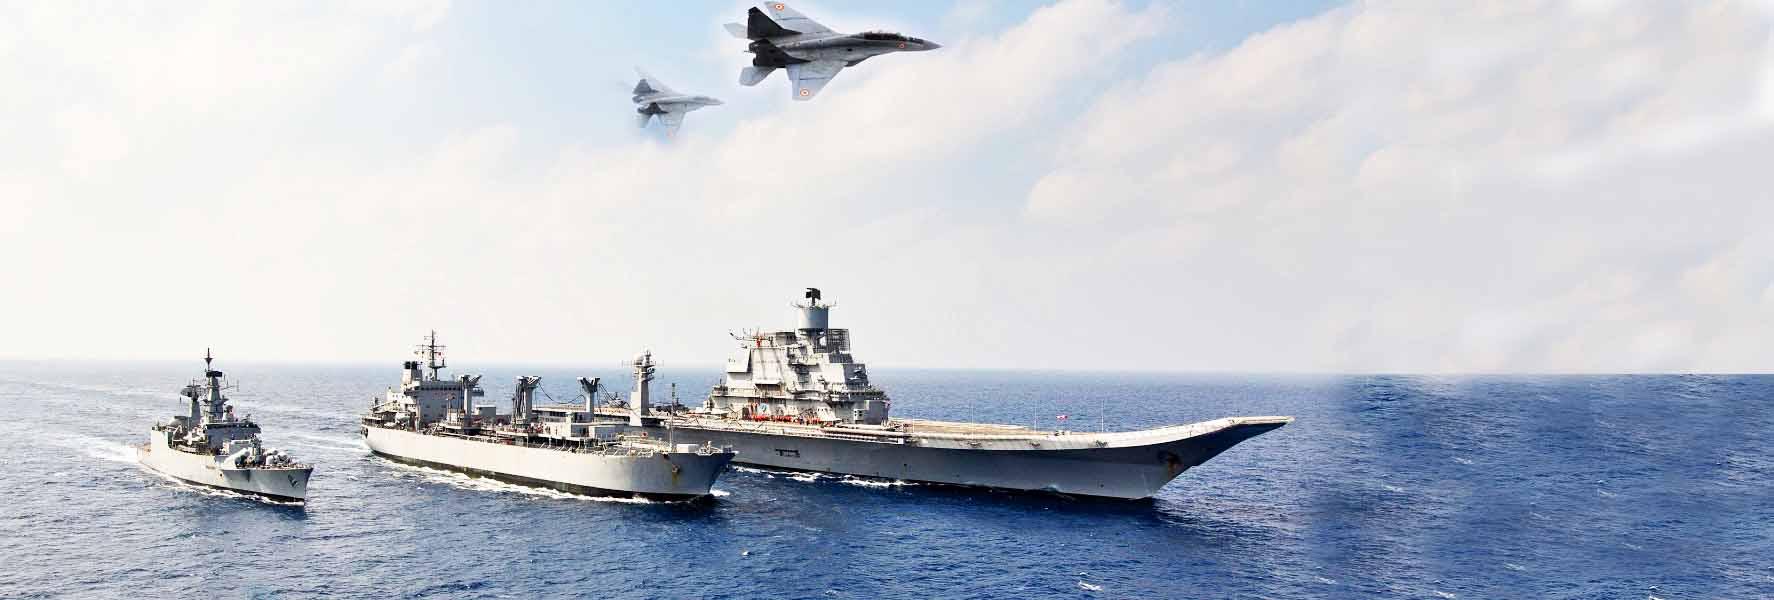 navy-aricraft